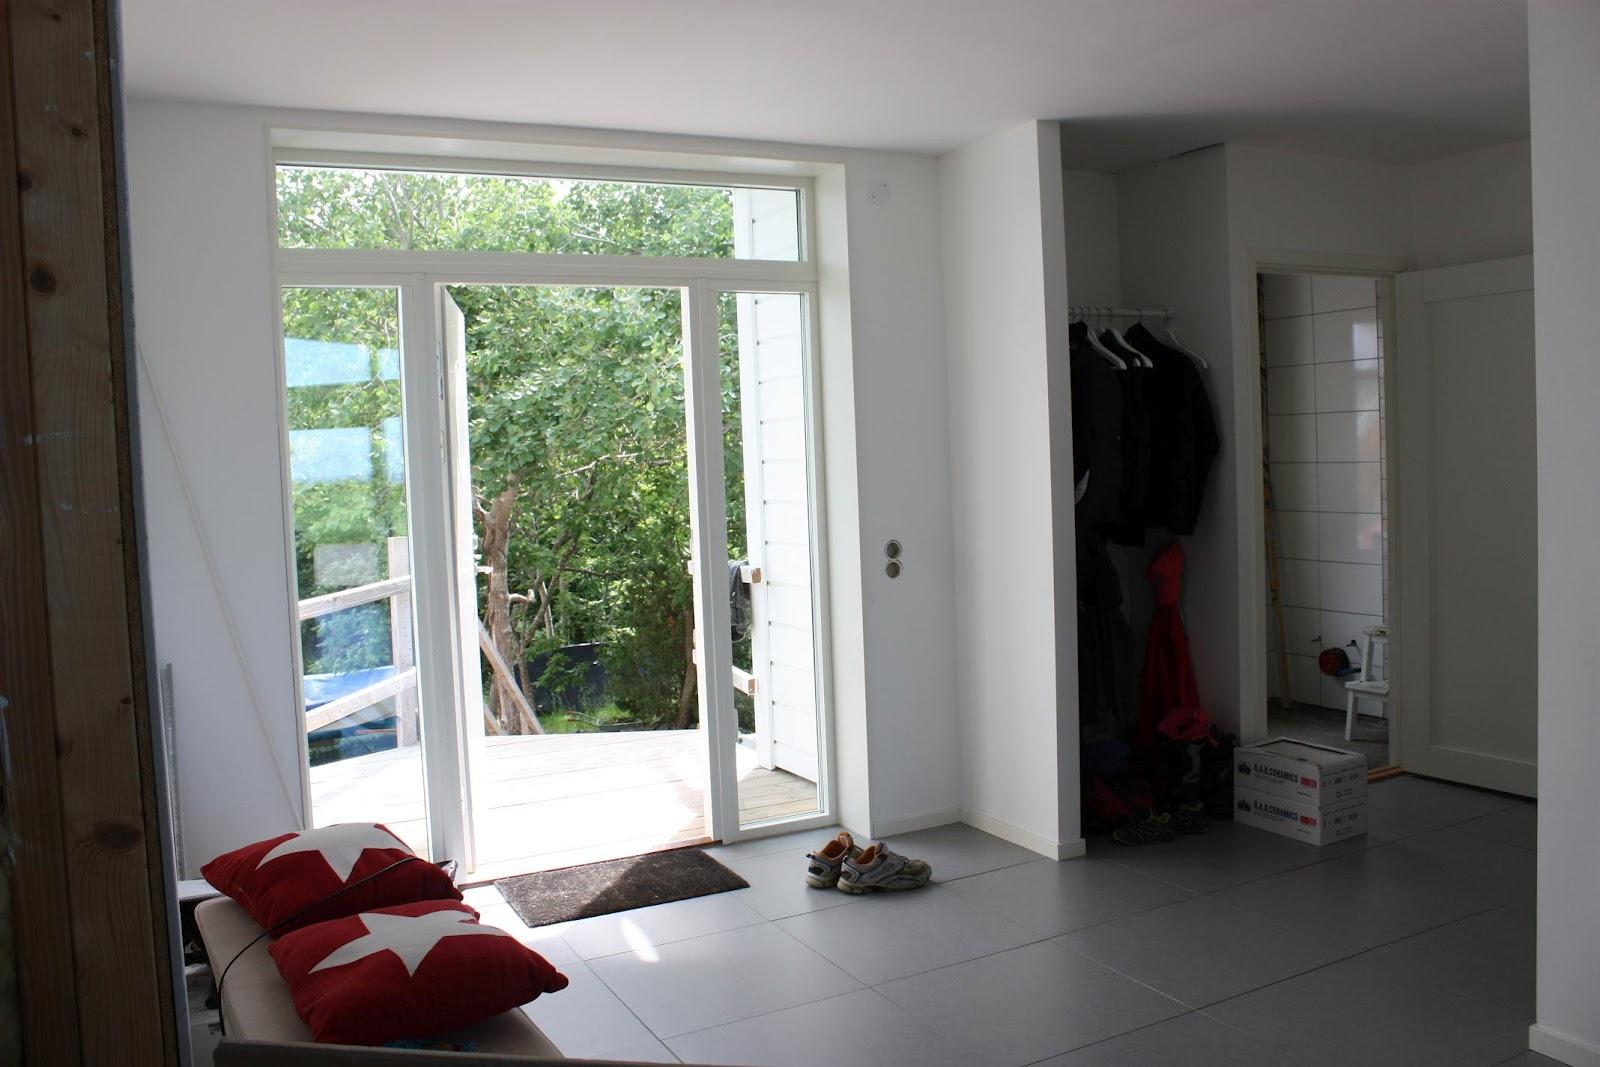 Villa billdal: badrum 2 & 3